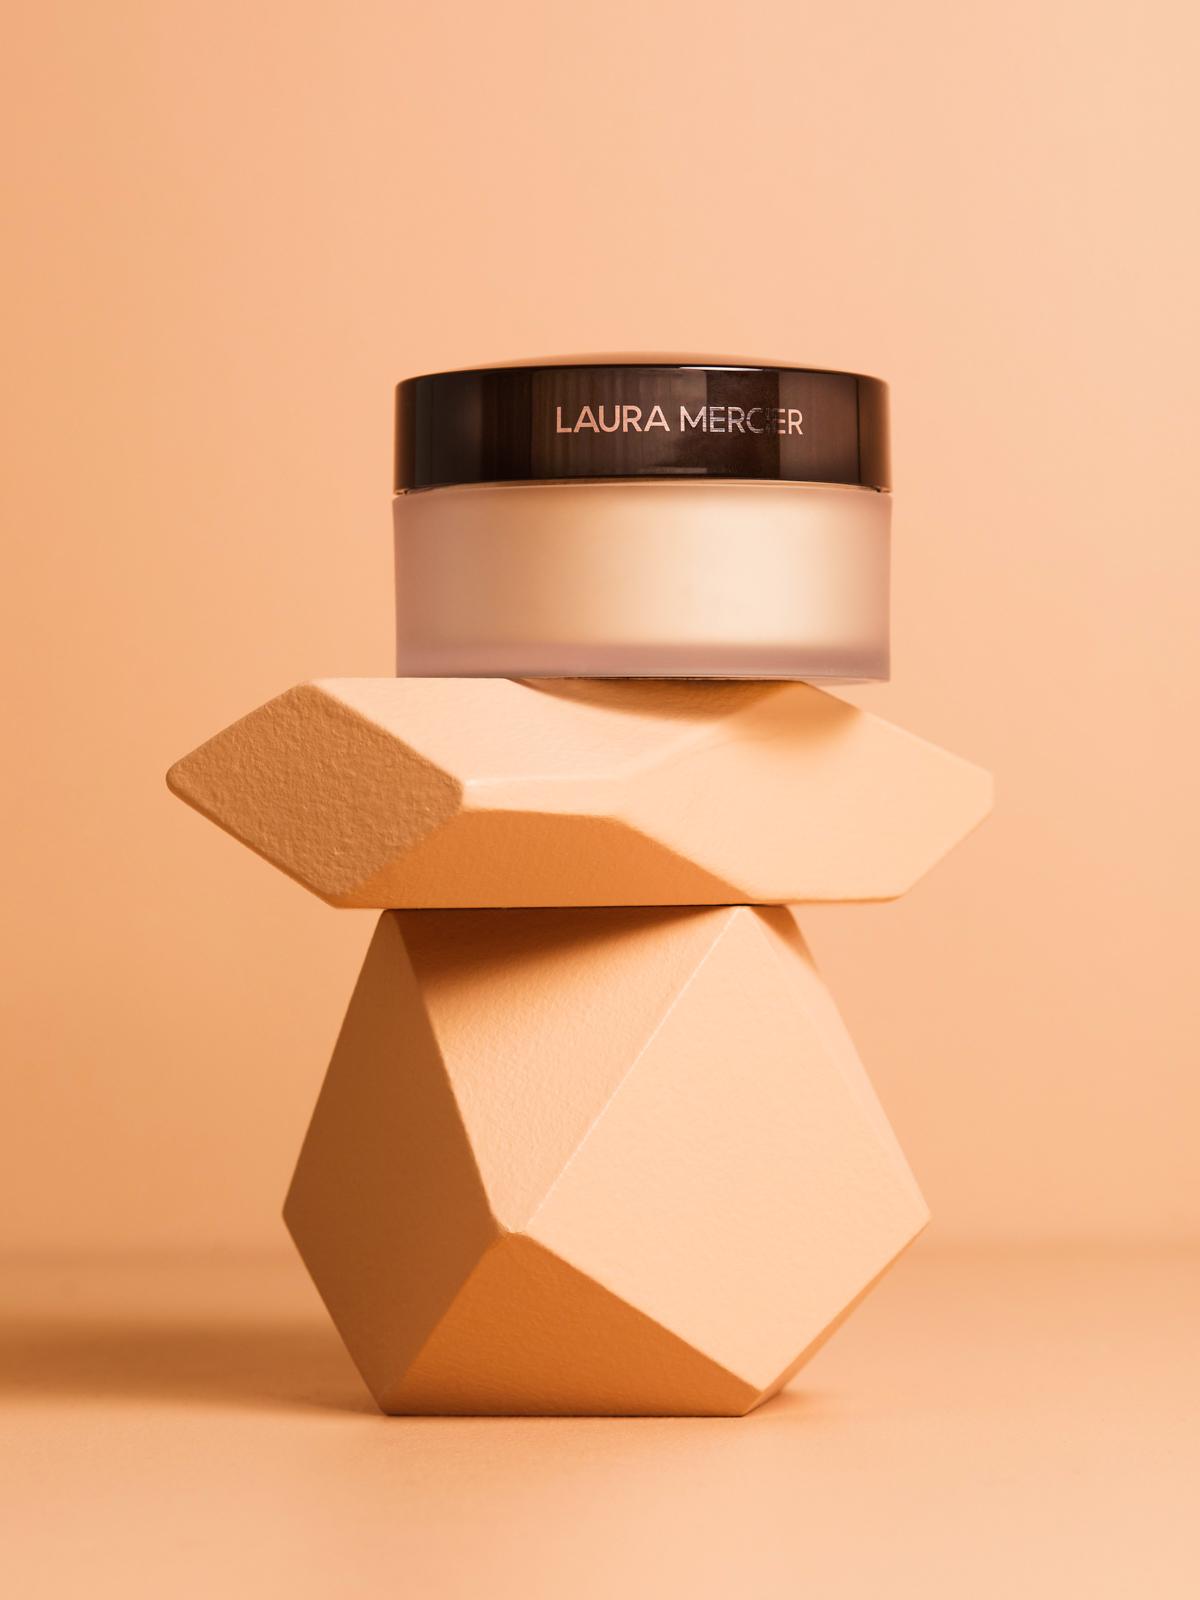 Currant Magazine presents a beauty holy grail: Laura Mercier Translucent loose setting powder.